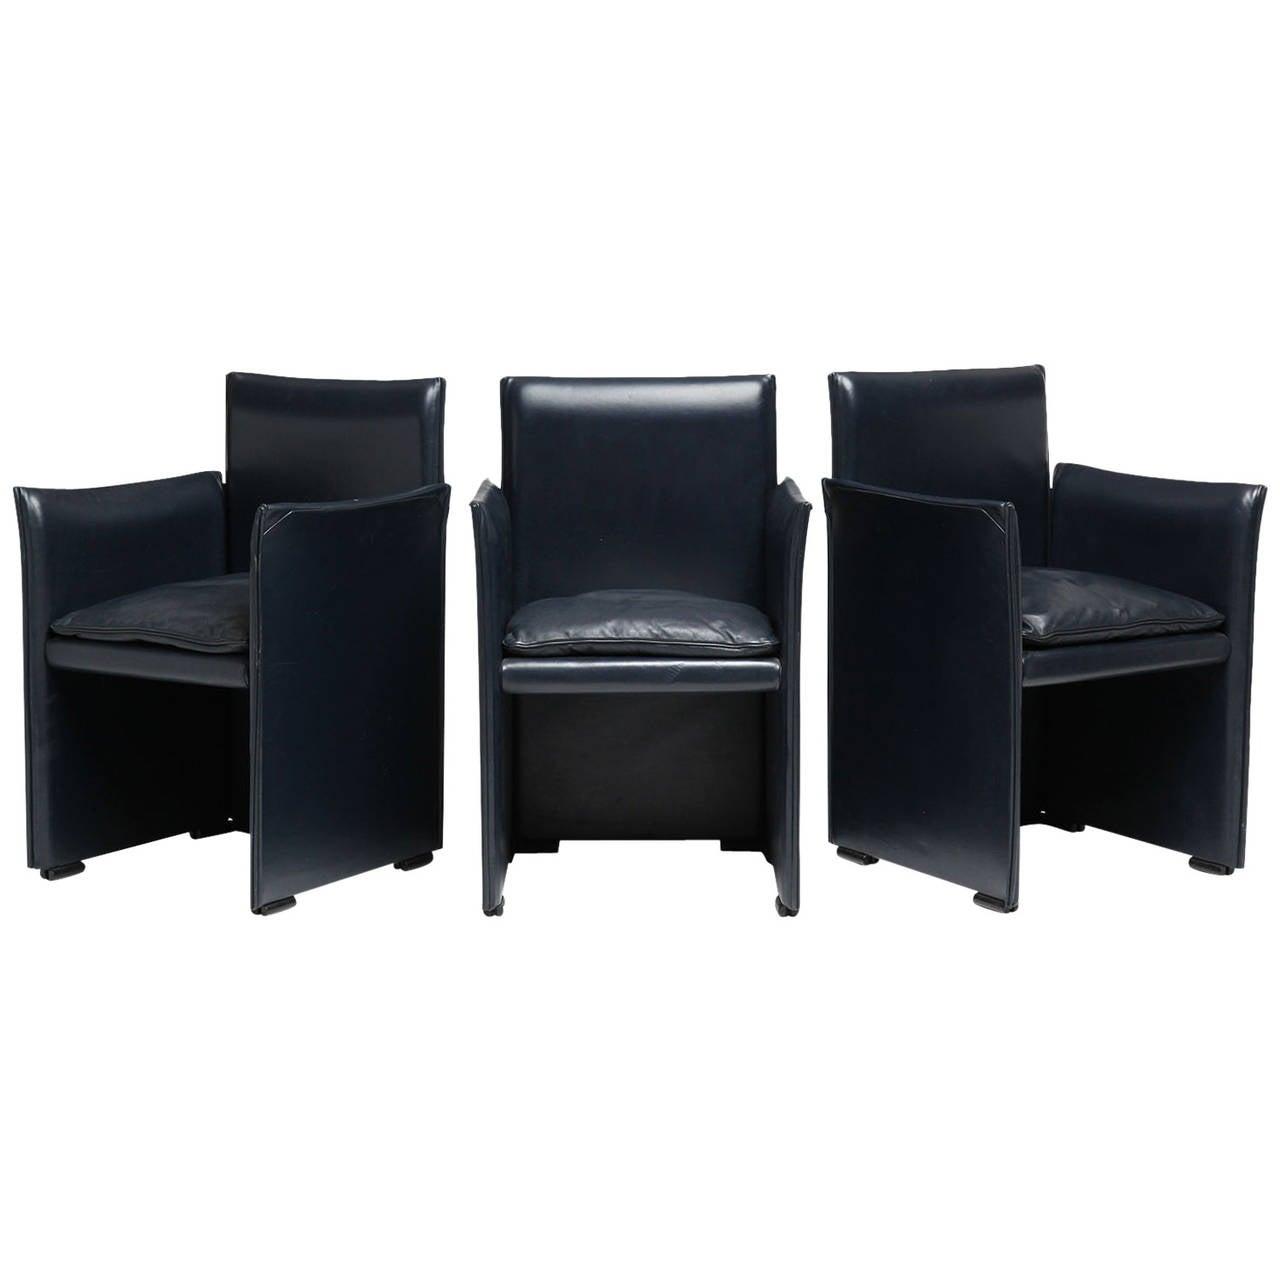 Armchair by Mario Bellini